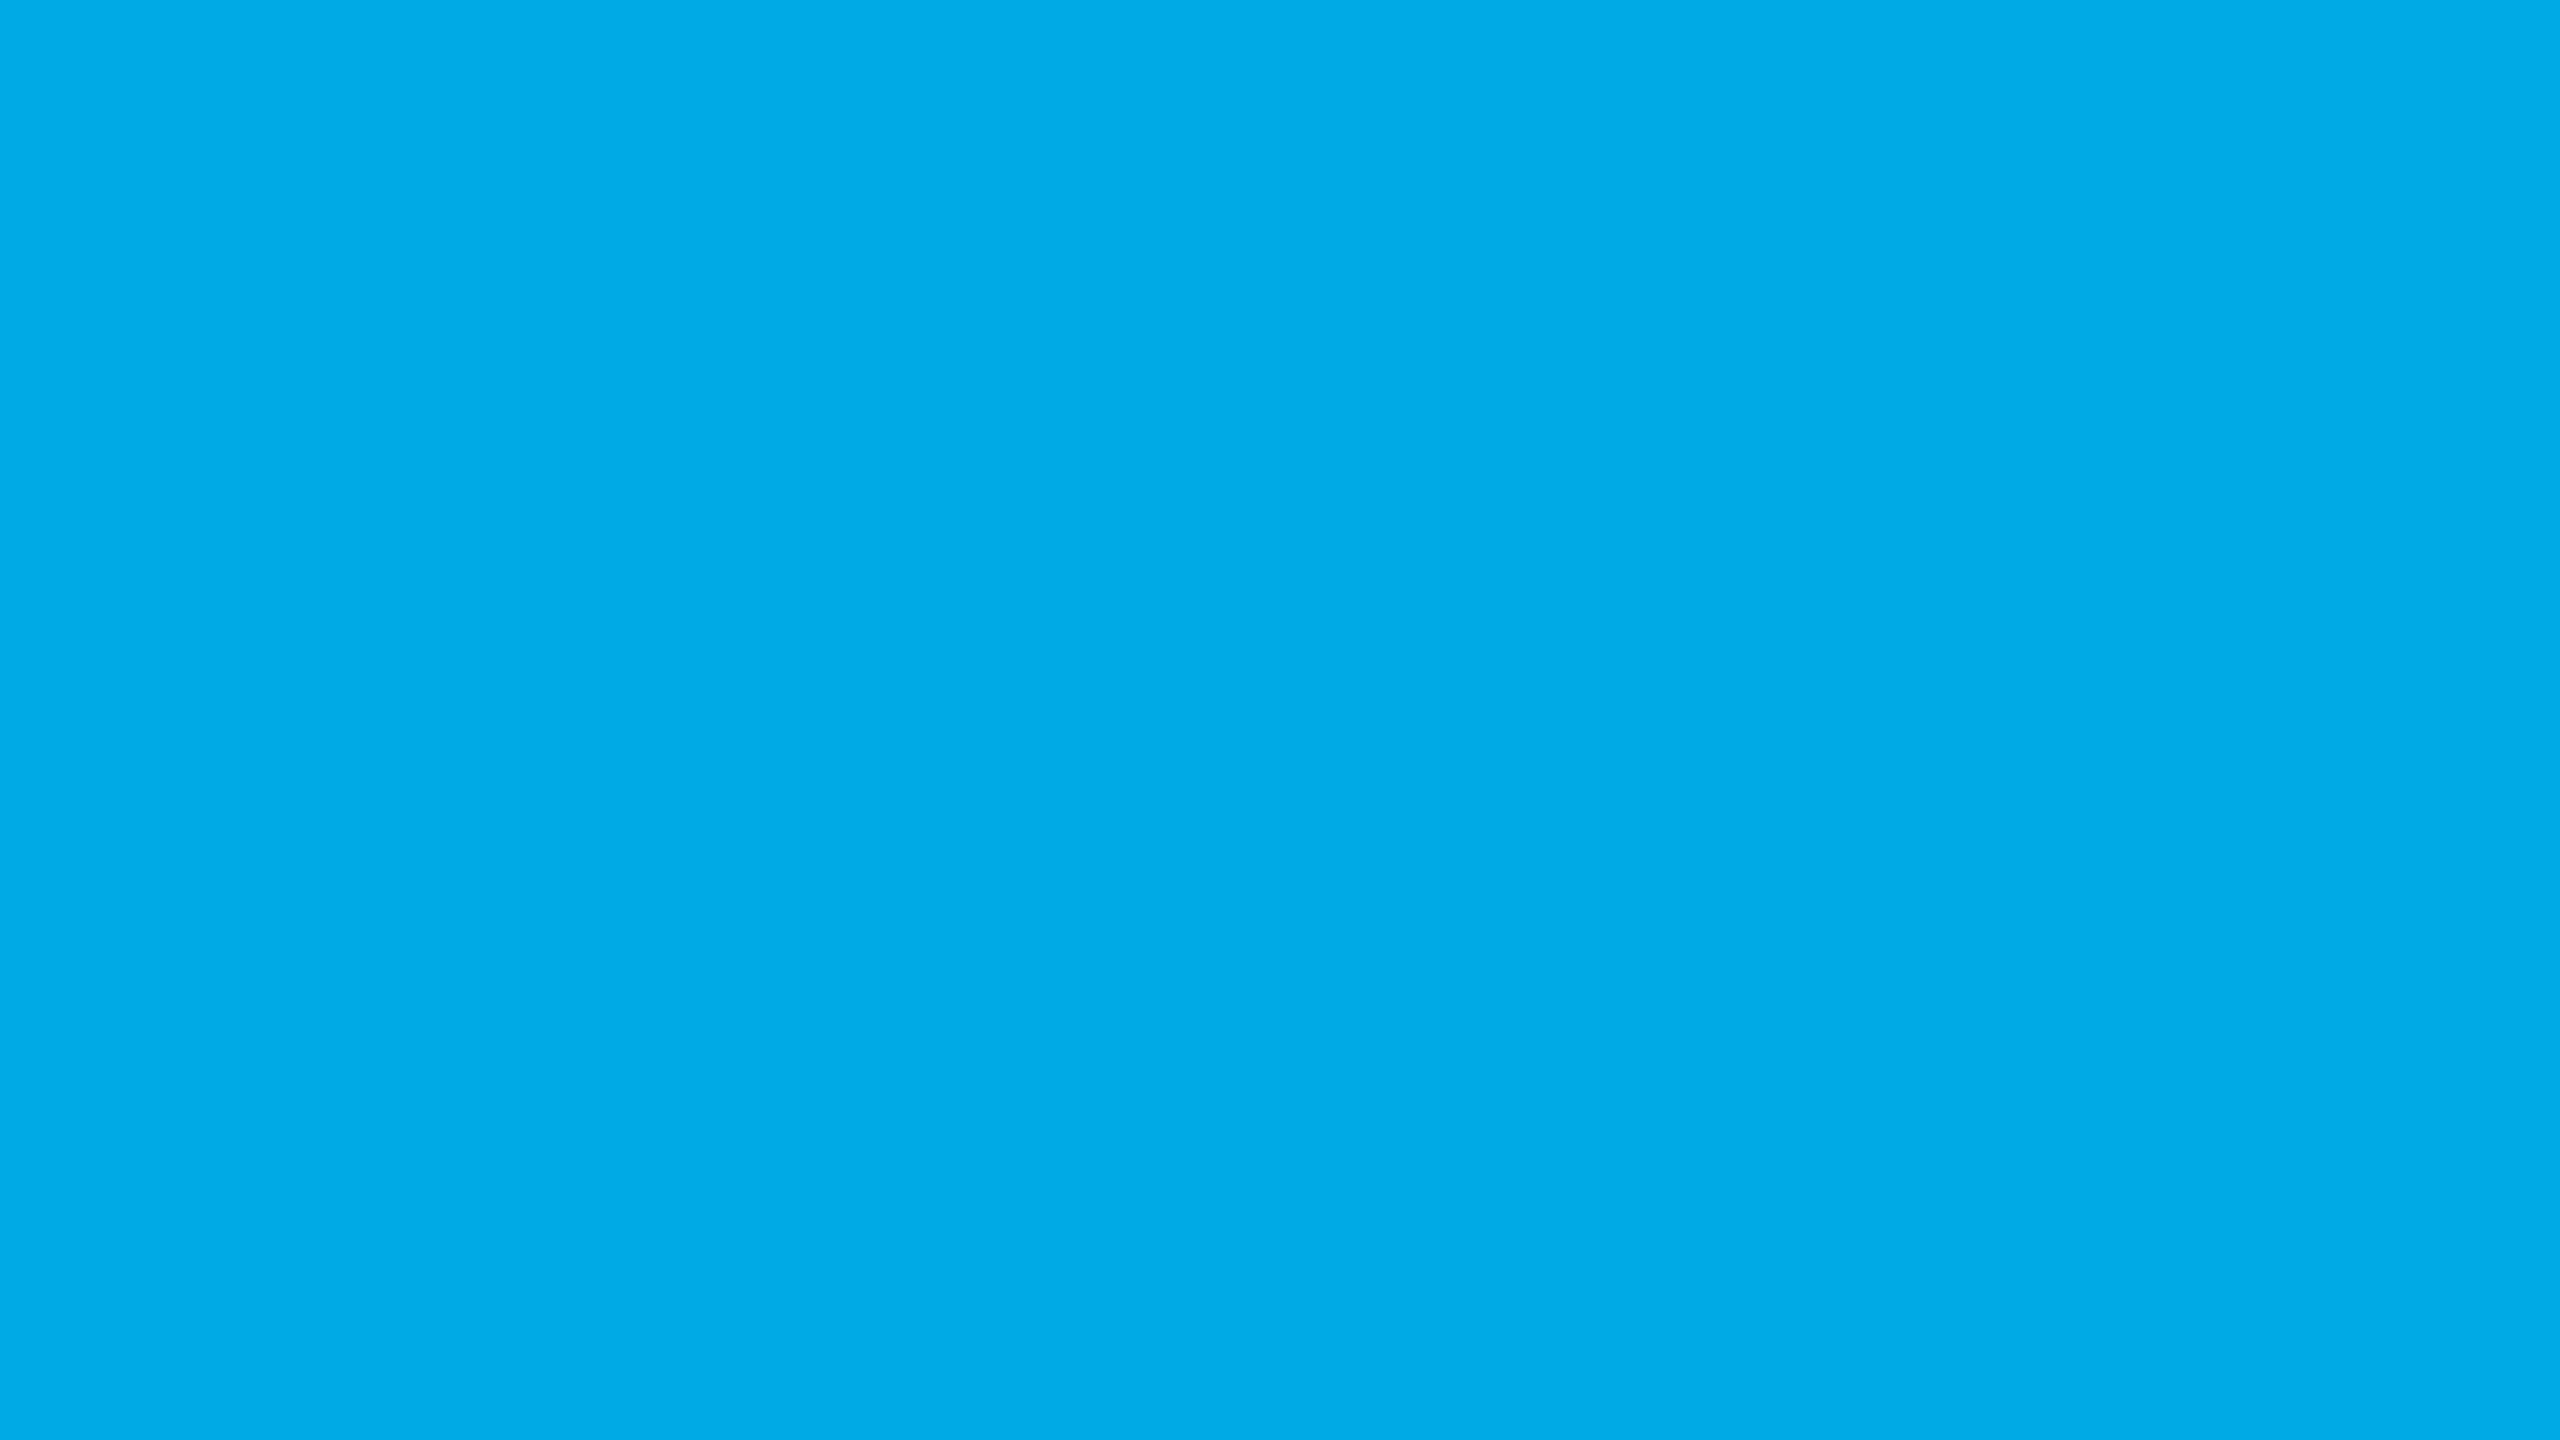 Plain blue wallpaper wallpapersafari for Plain wallpaper